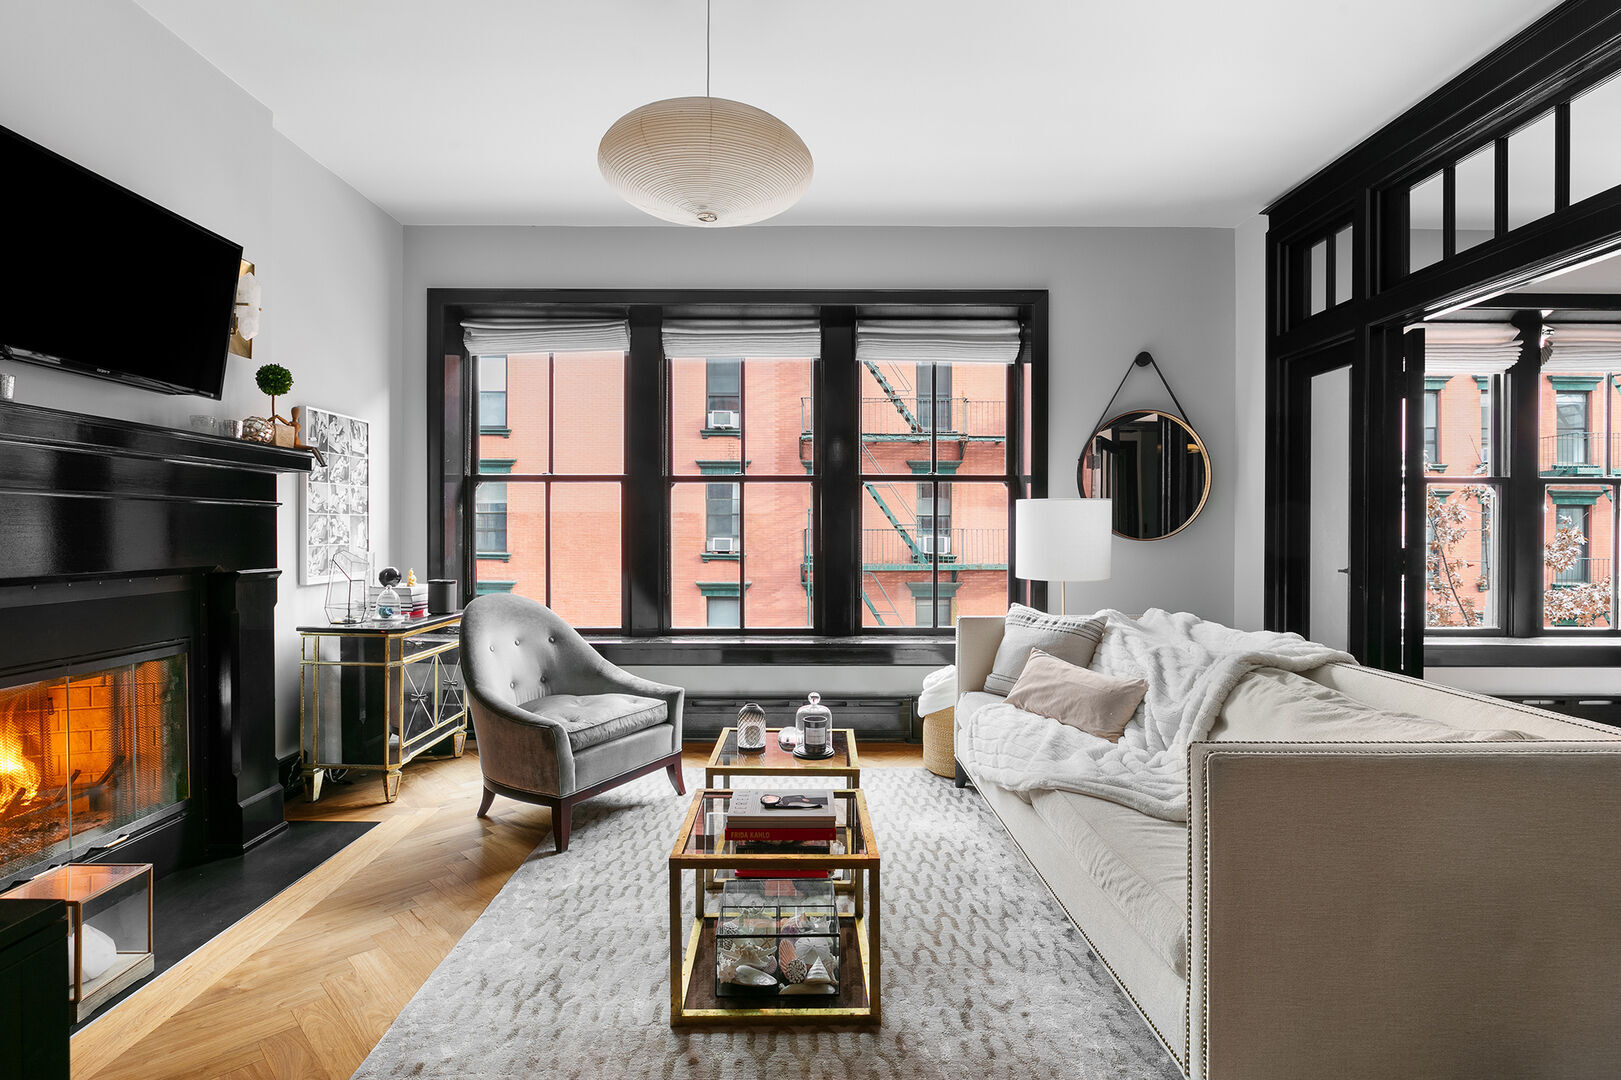 Apartment for sale at 211 Elizabeth Street, Apt 3-E